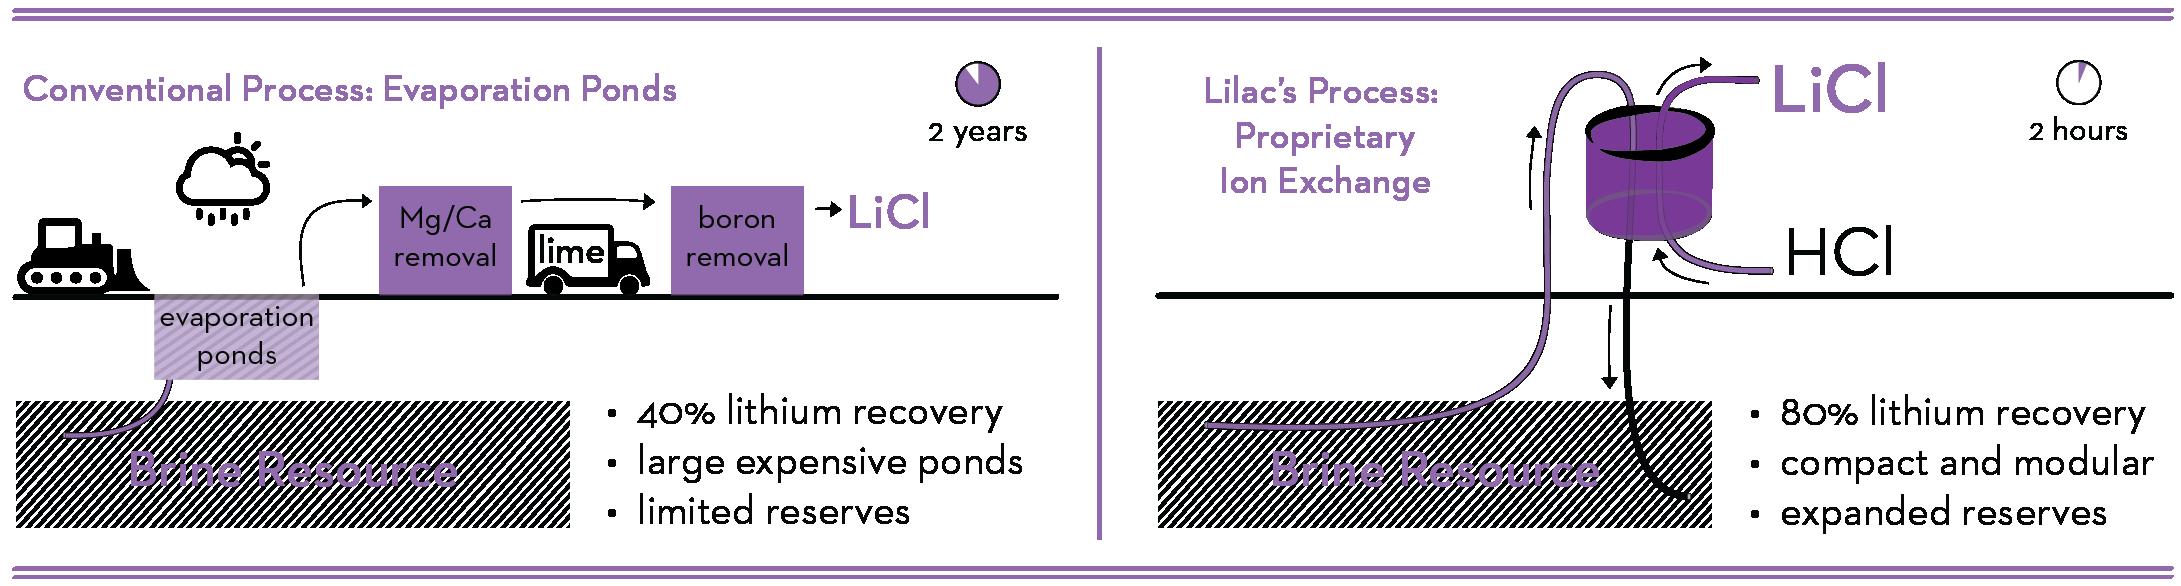 Lilac Solutions - Process Comparison Diagrams_2018.08-bullets.png